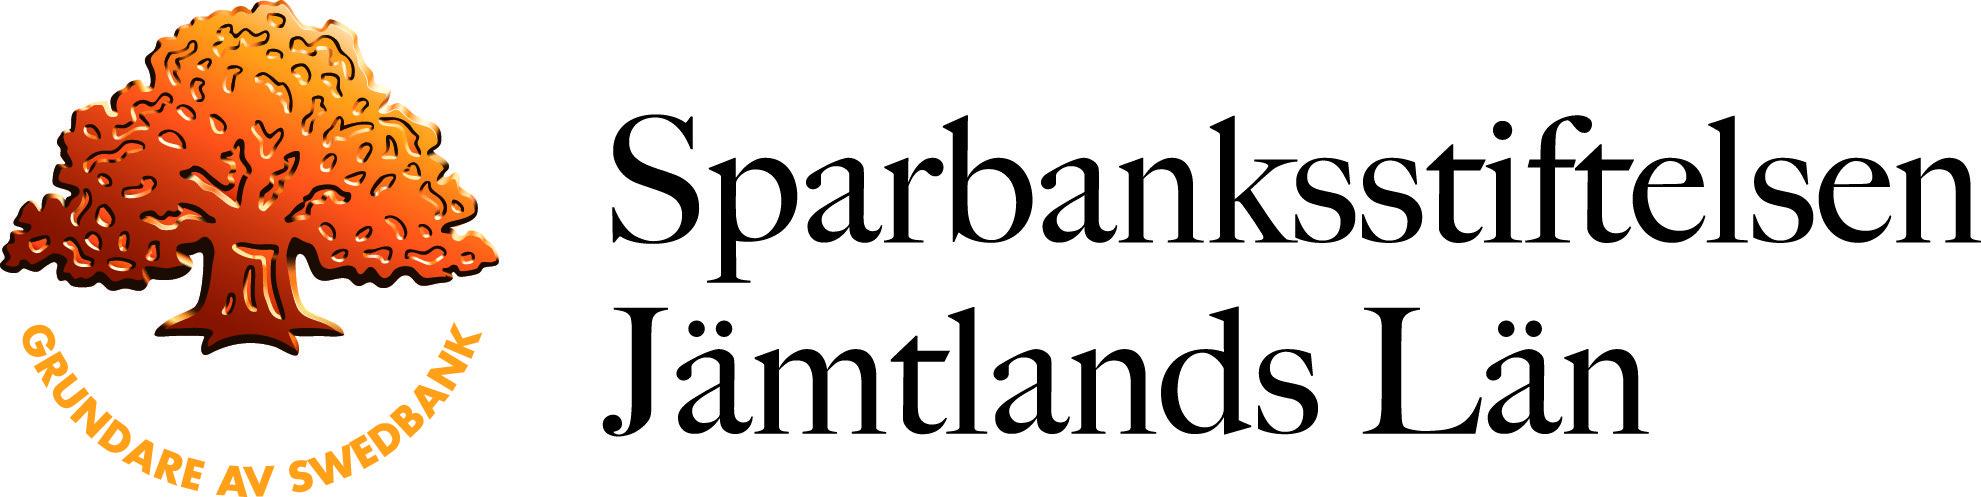 Sparbanksstiftelsens logotyp